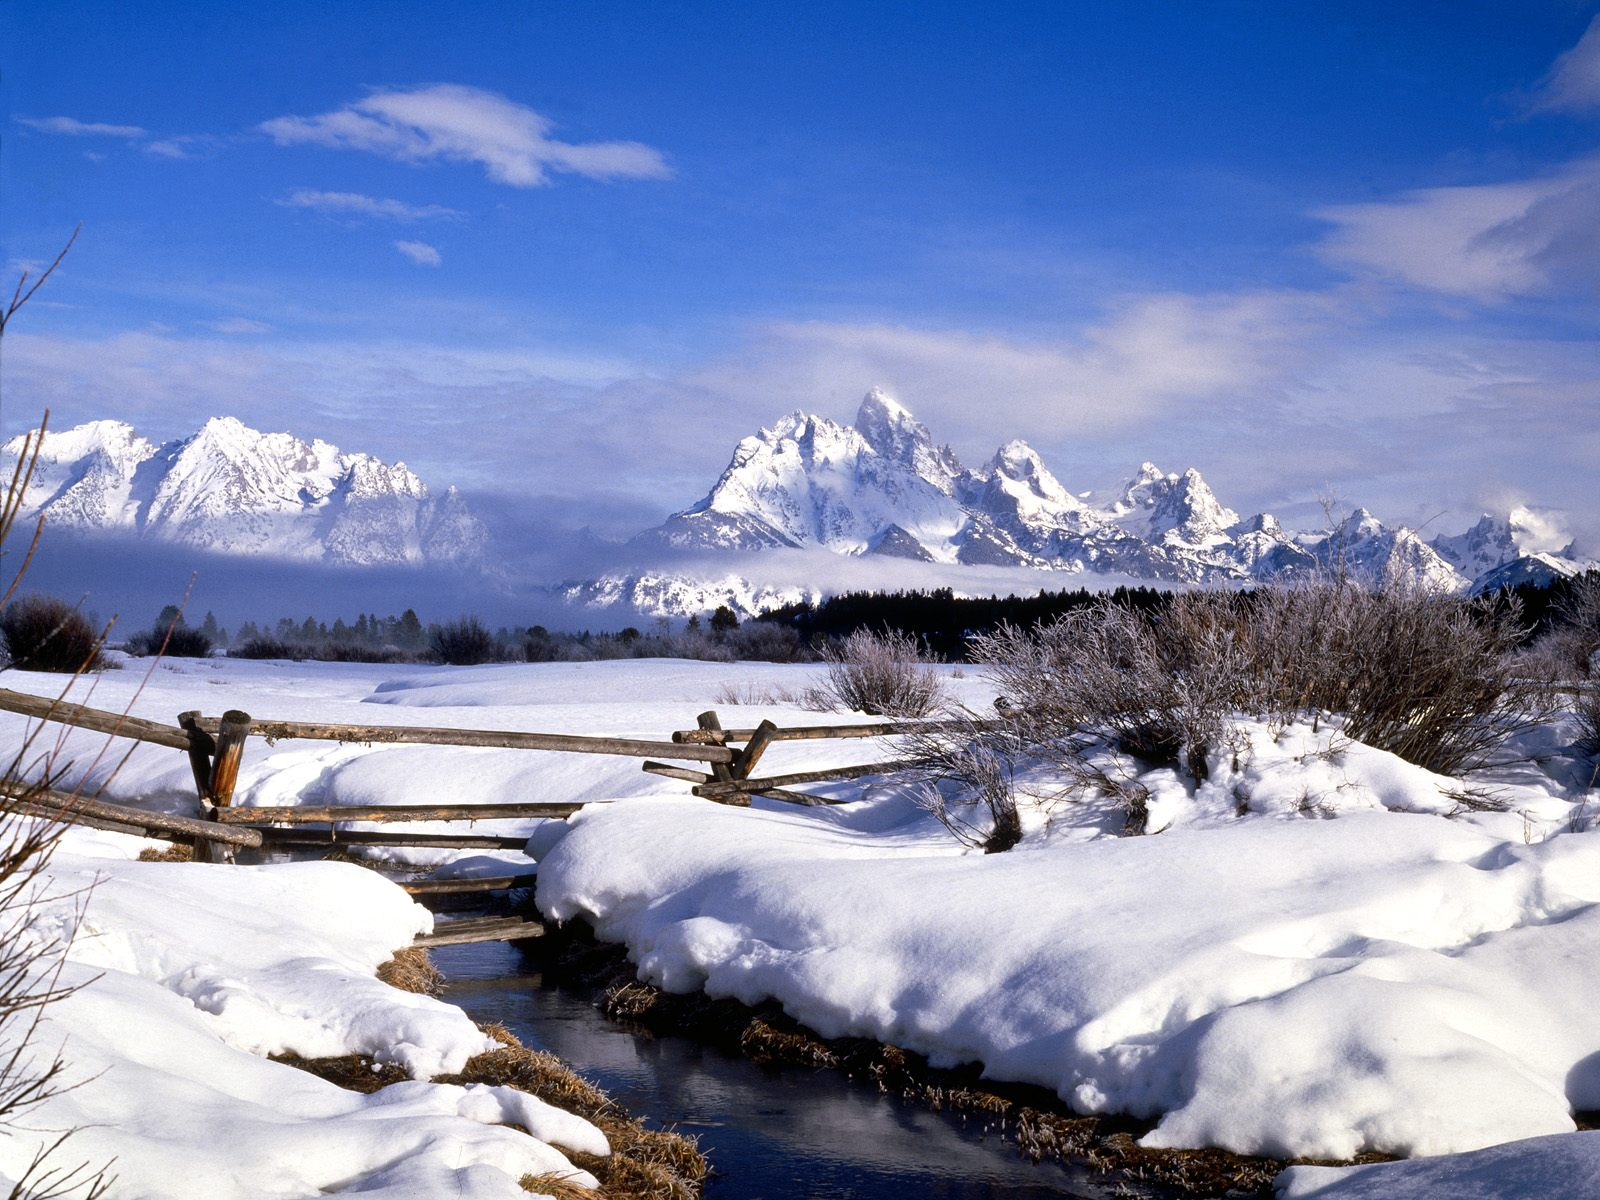 winter-Nature-HD-Winter-HD-wallpaper-wp4210722